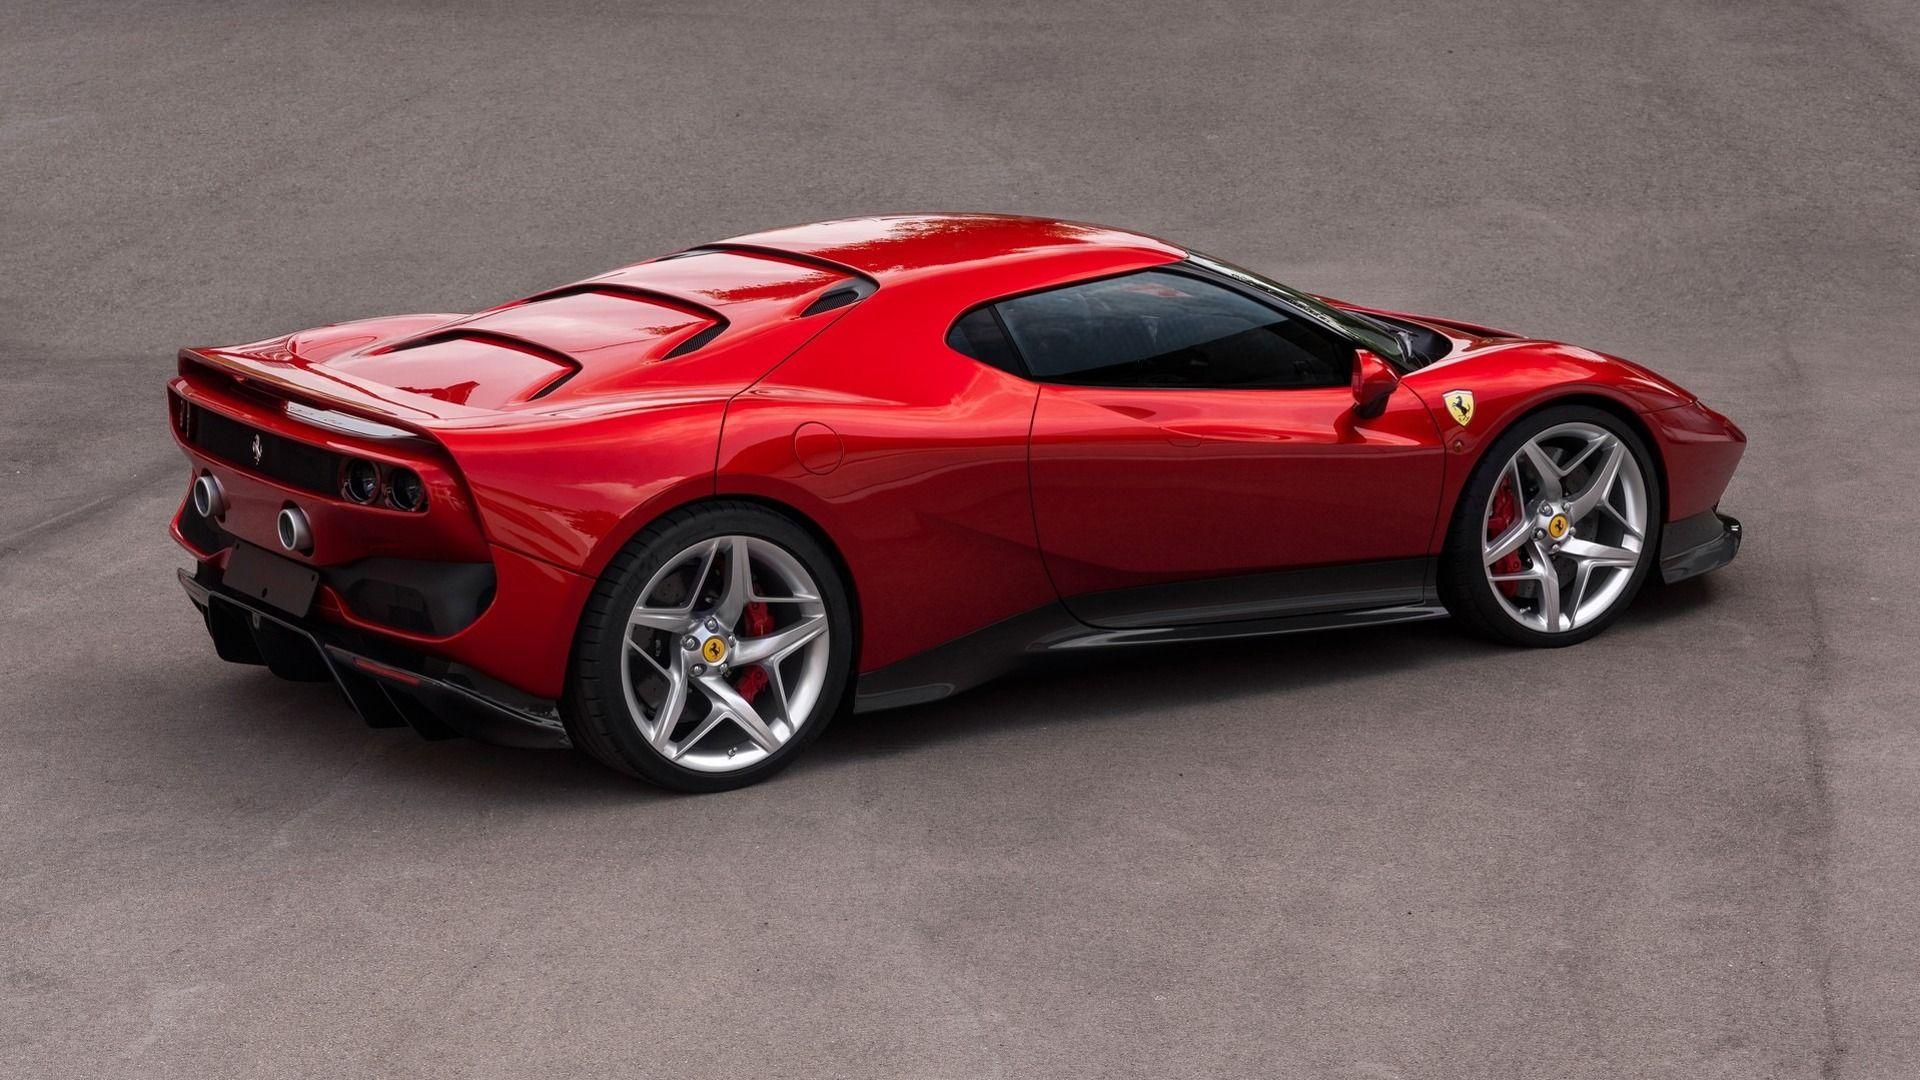 Ferrari Sp38 Un Superdeportivo Fabricado A Capricho De